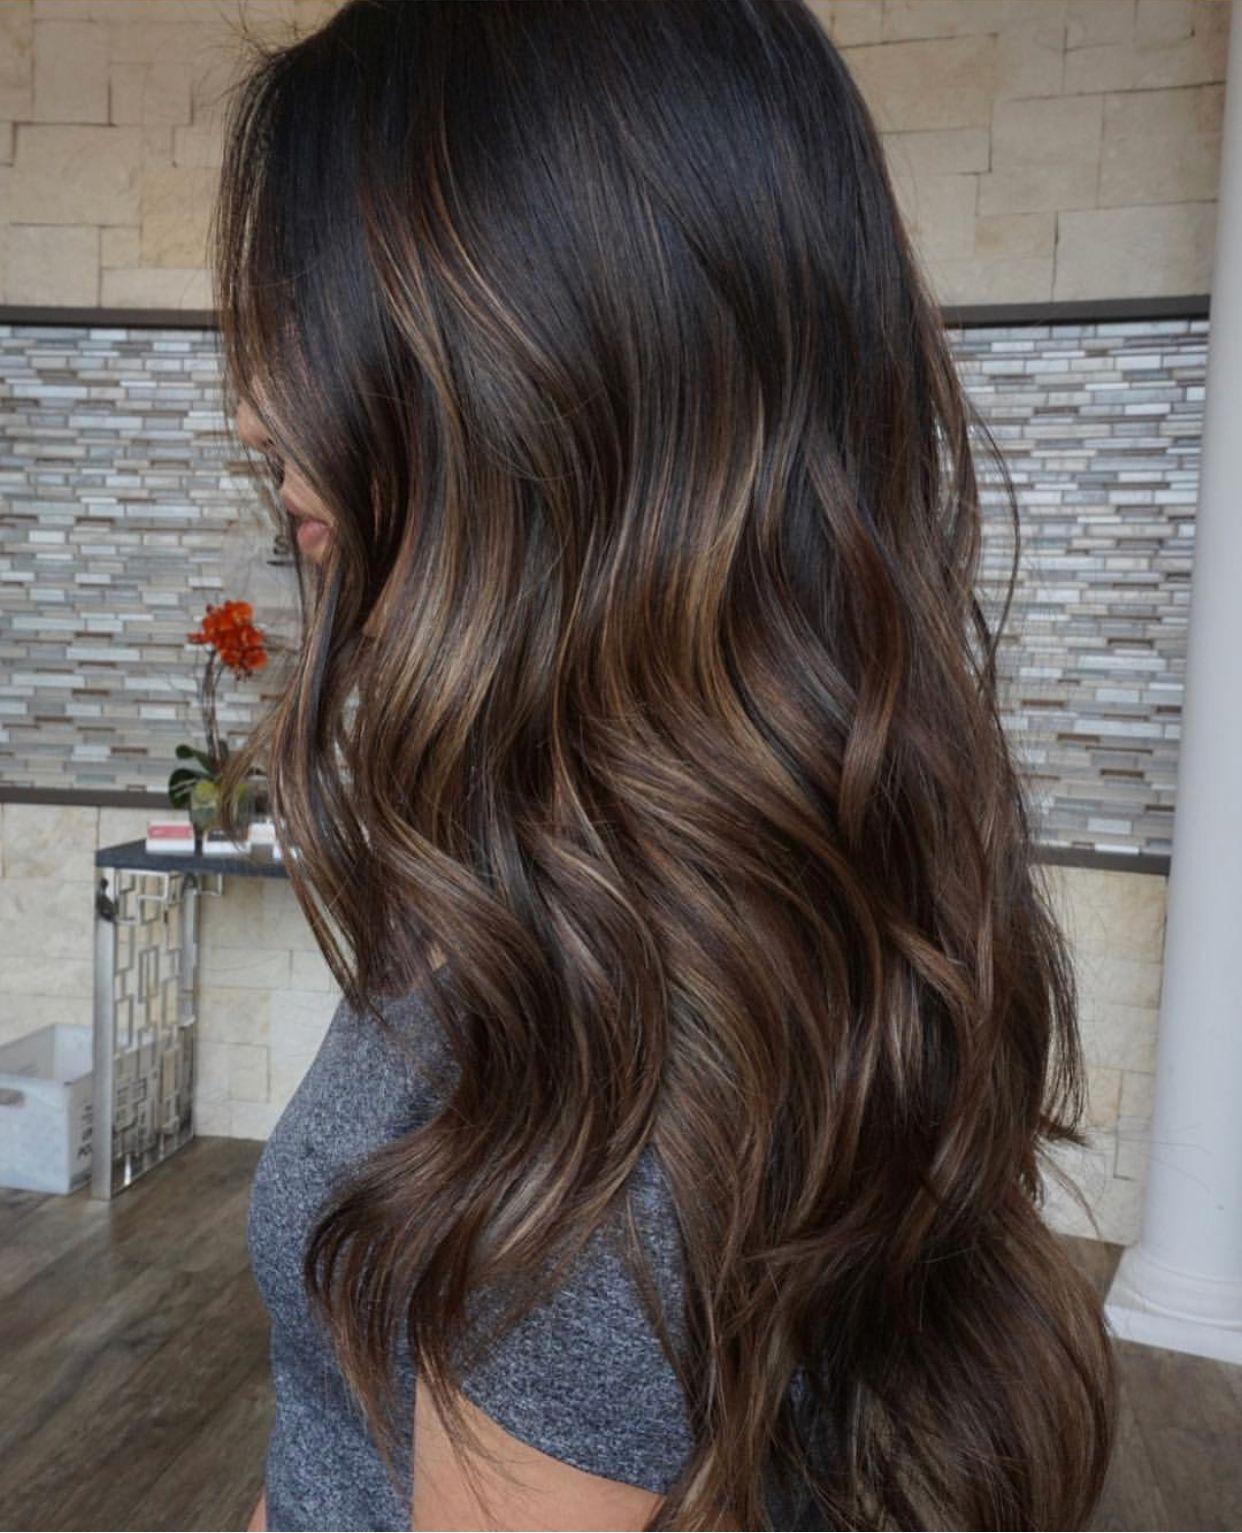 Different Shades Same Subtle Highlights Brown Hair Balayage Hair Styles Balayage Hair